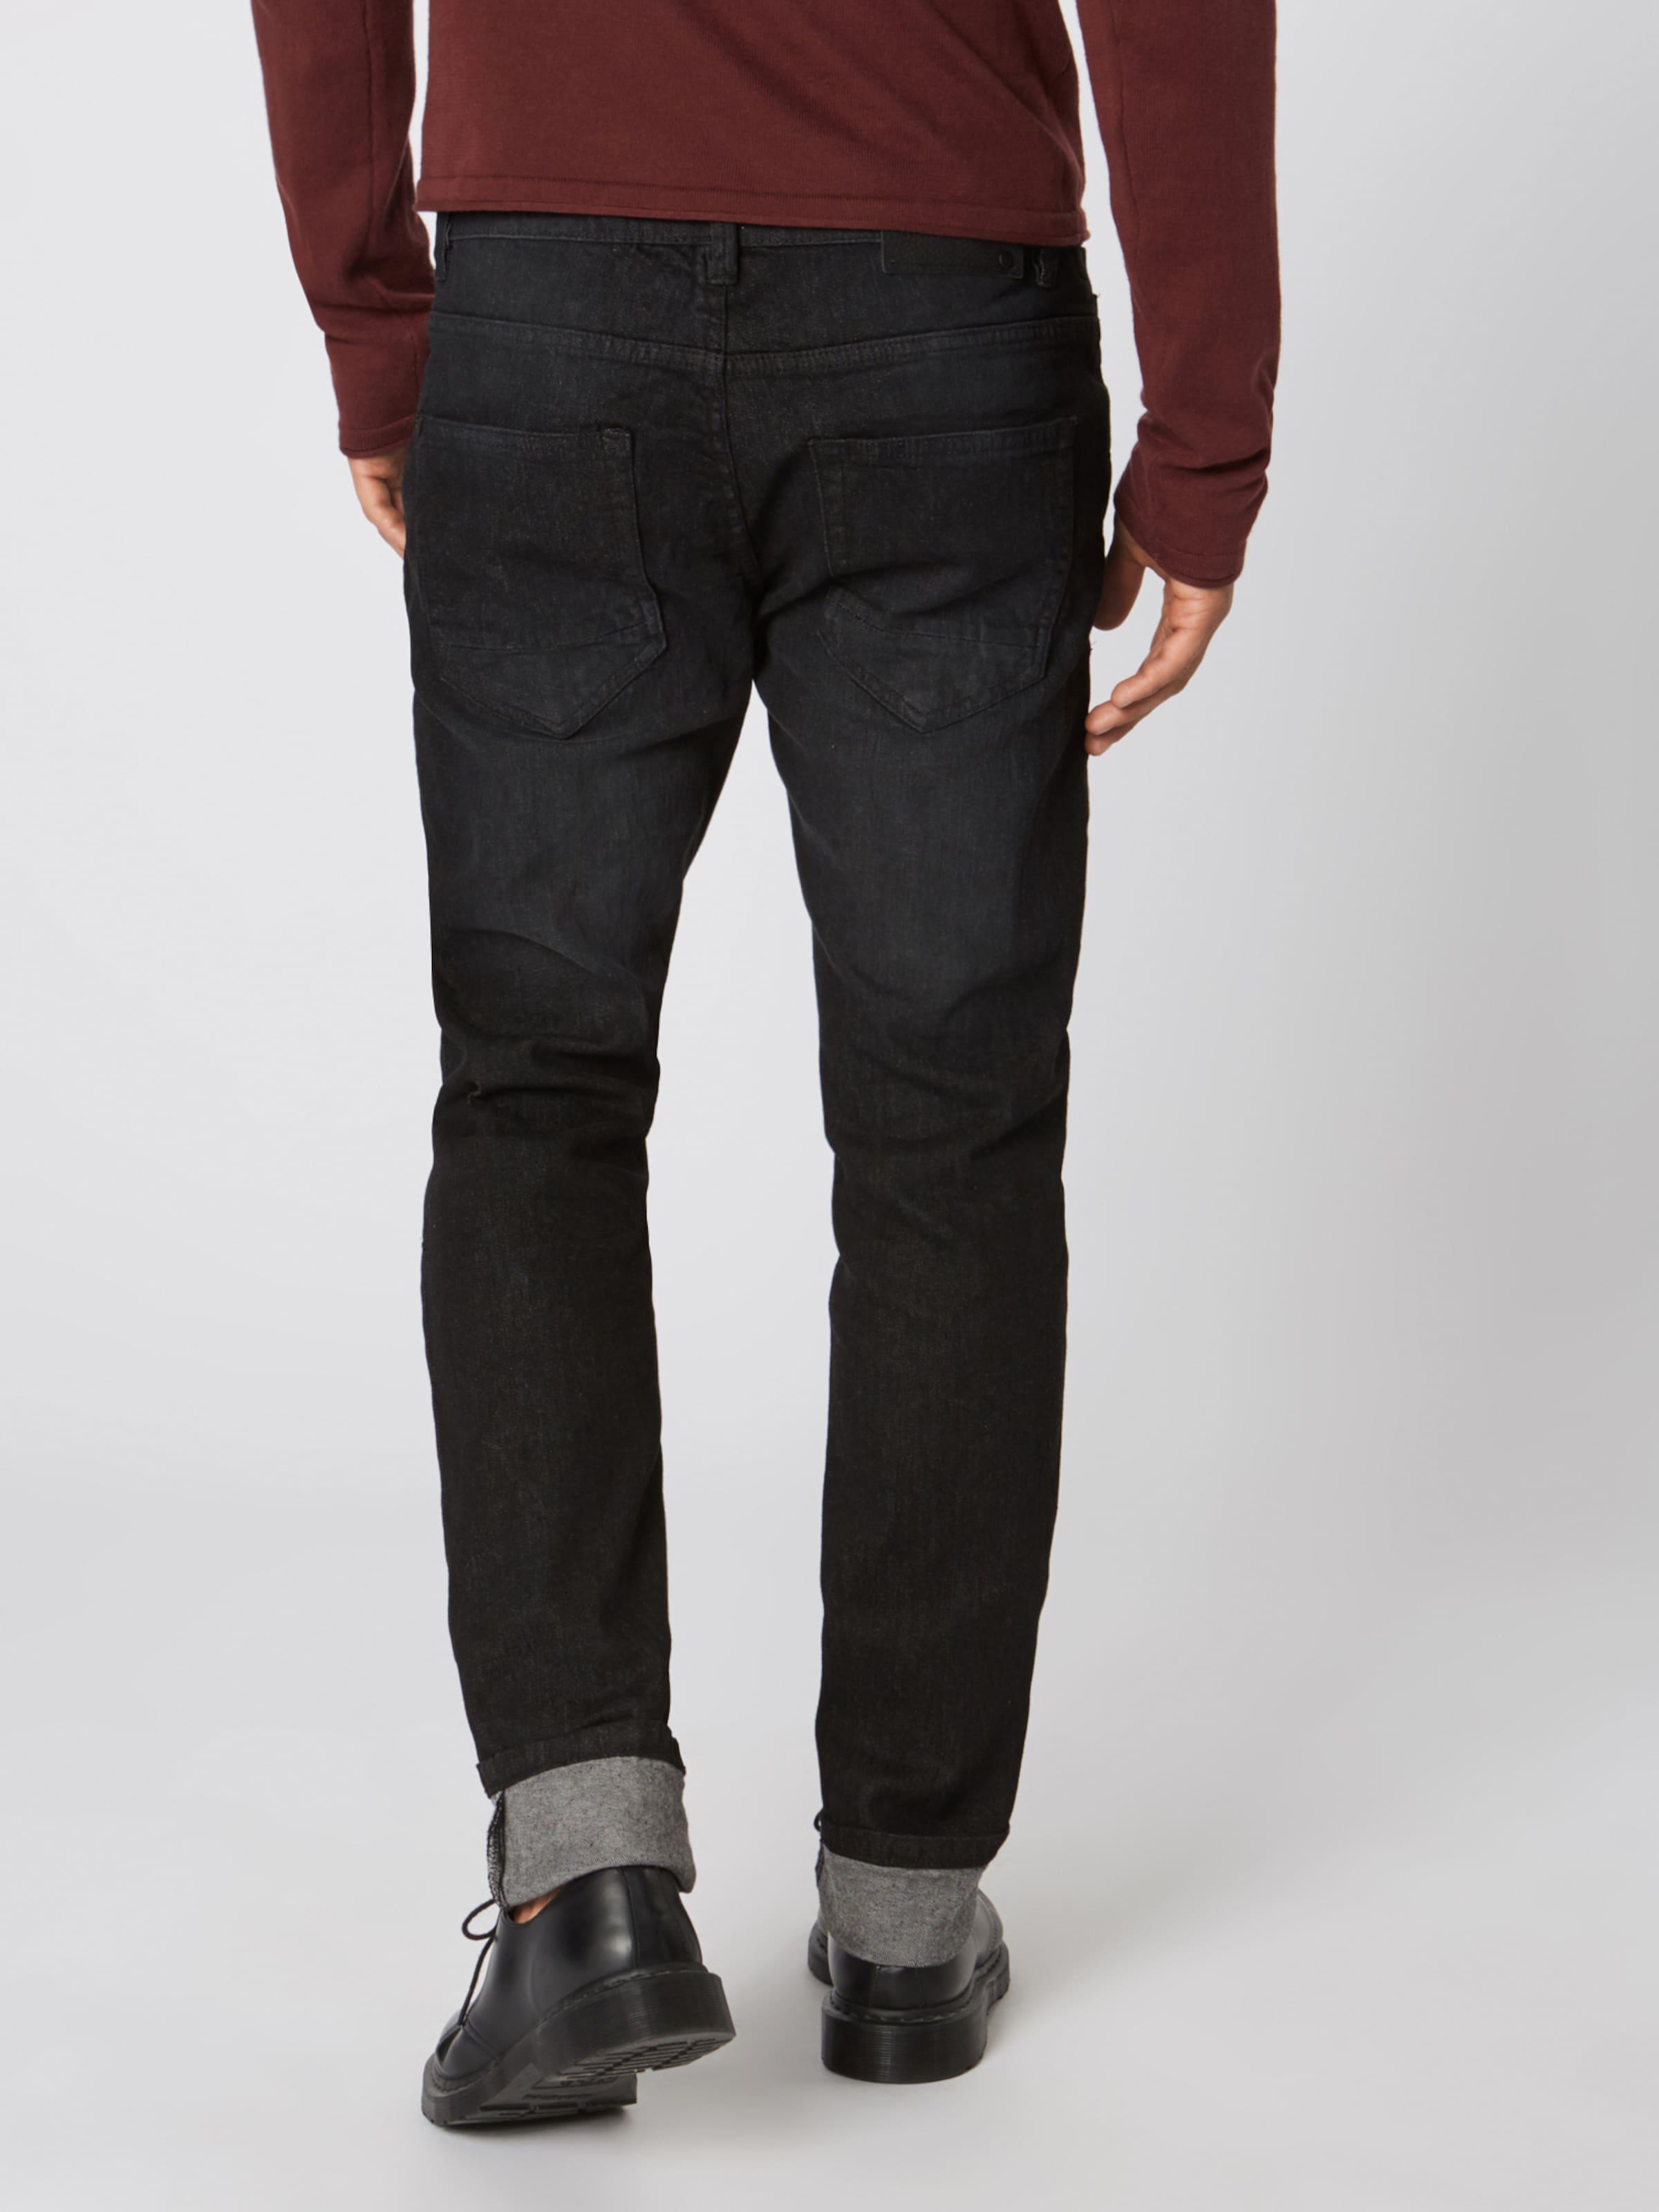 Indicode Jeans 'pitsburg' Bleu Foncé Jean En Yfgyb6v7